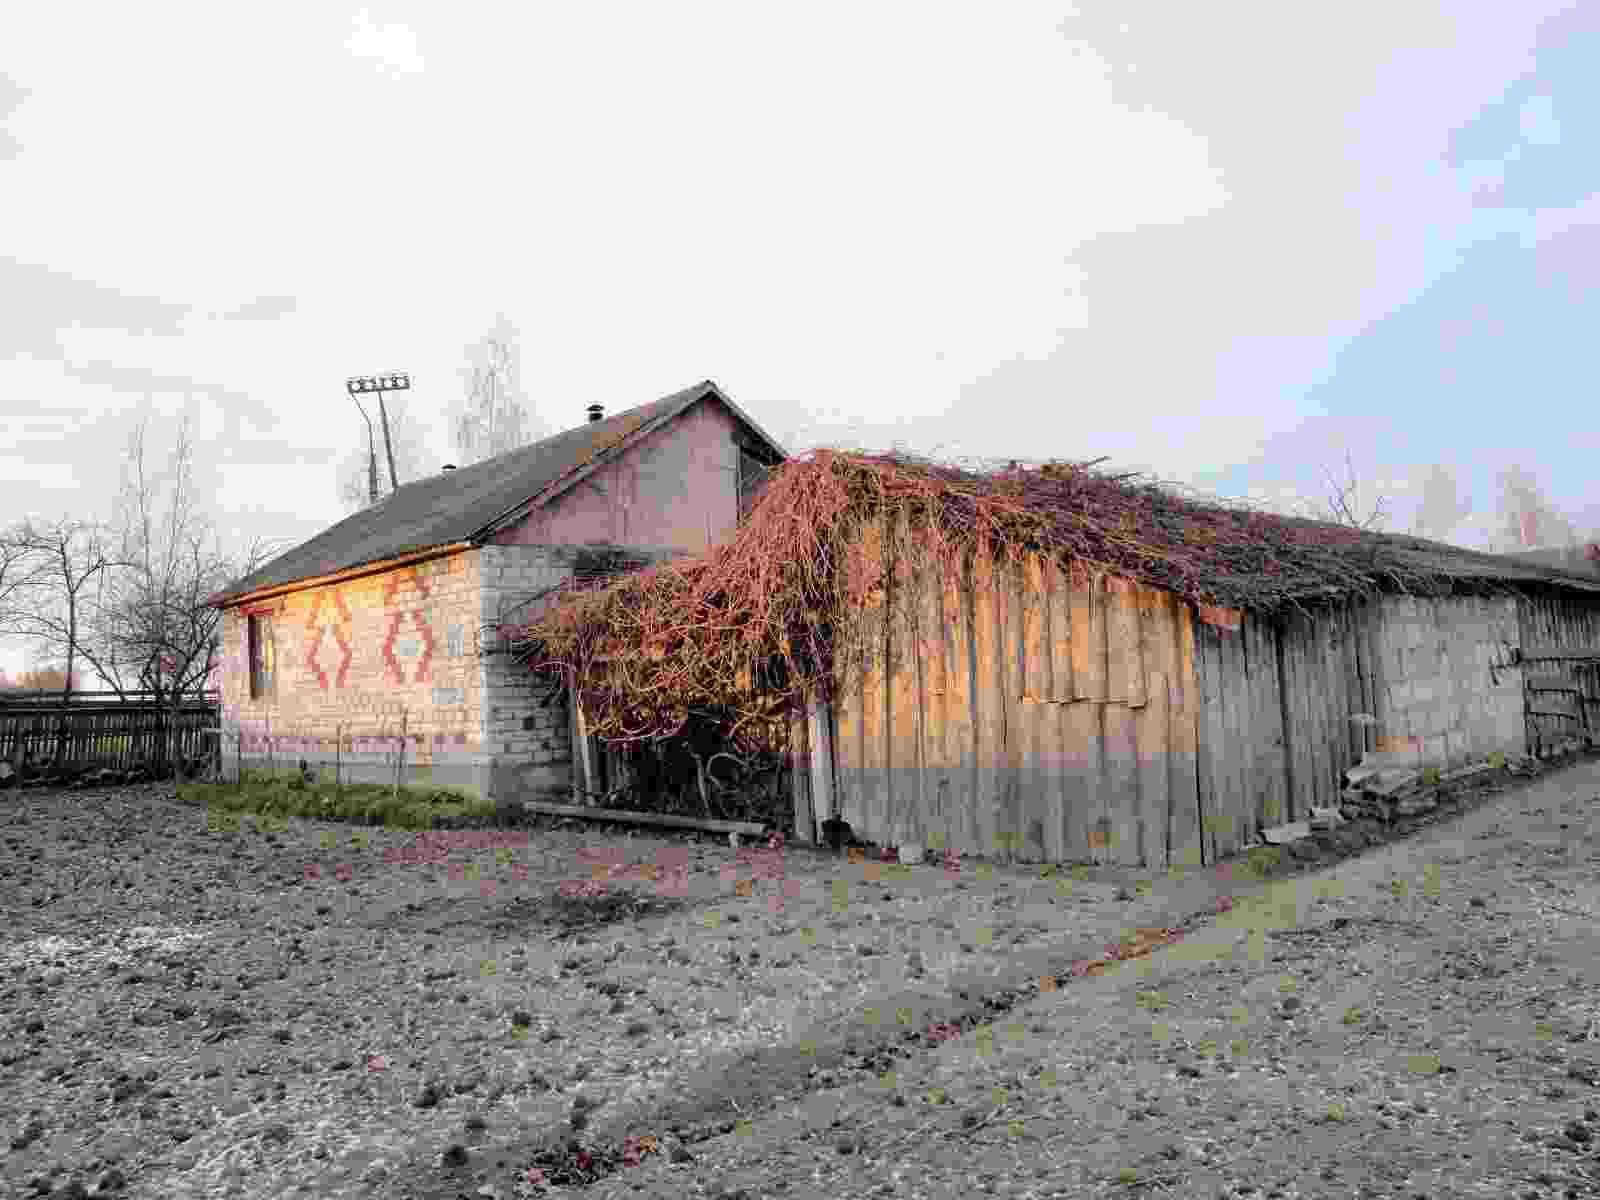 Продажа дома  в гп.Краснополье по ул. Шеменкова, 7. Фото